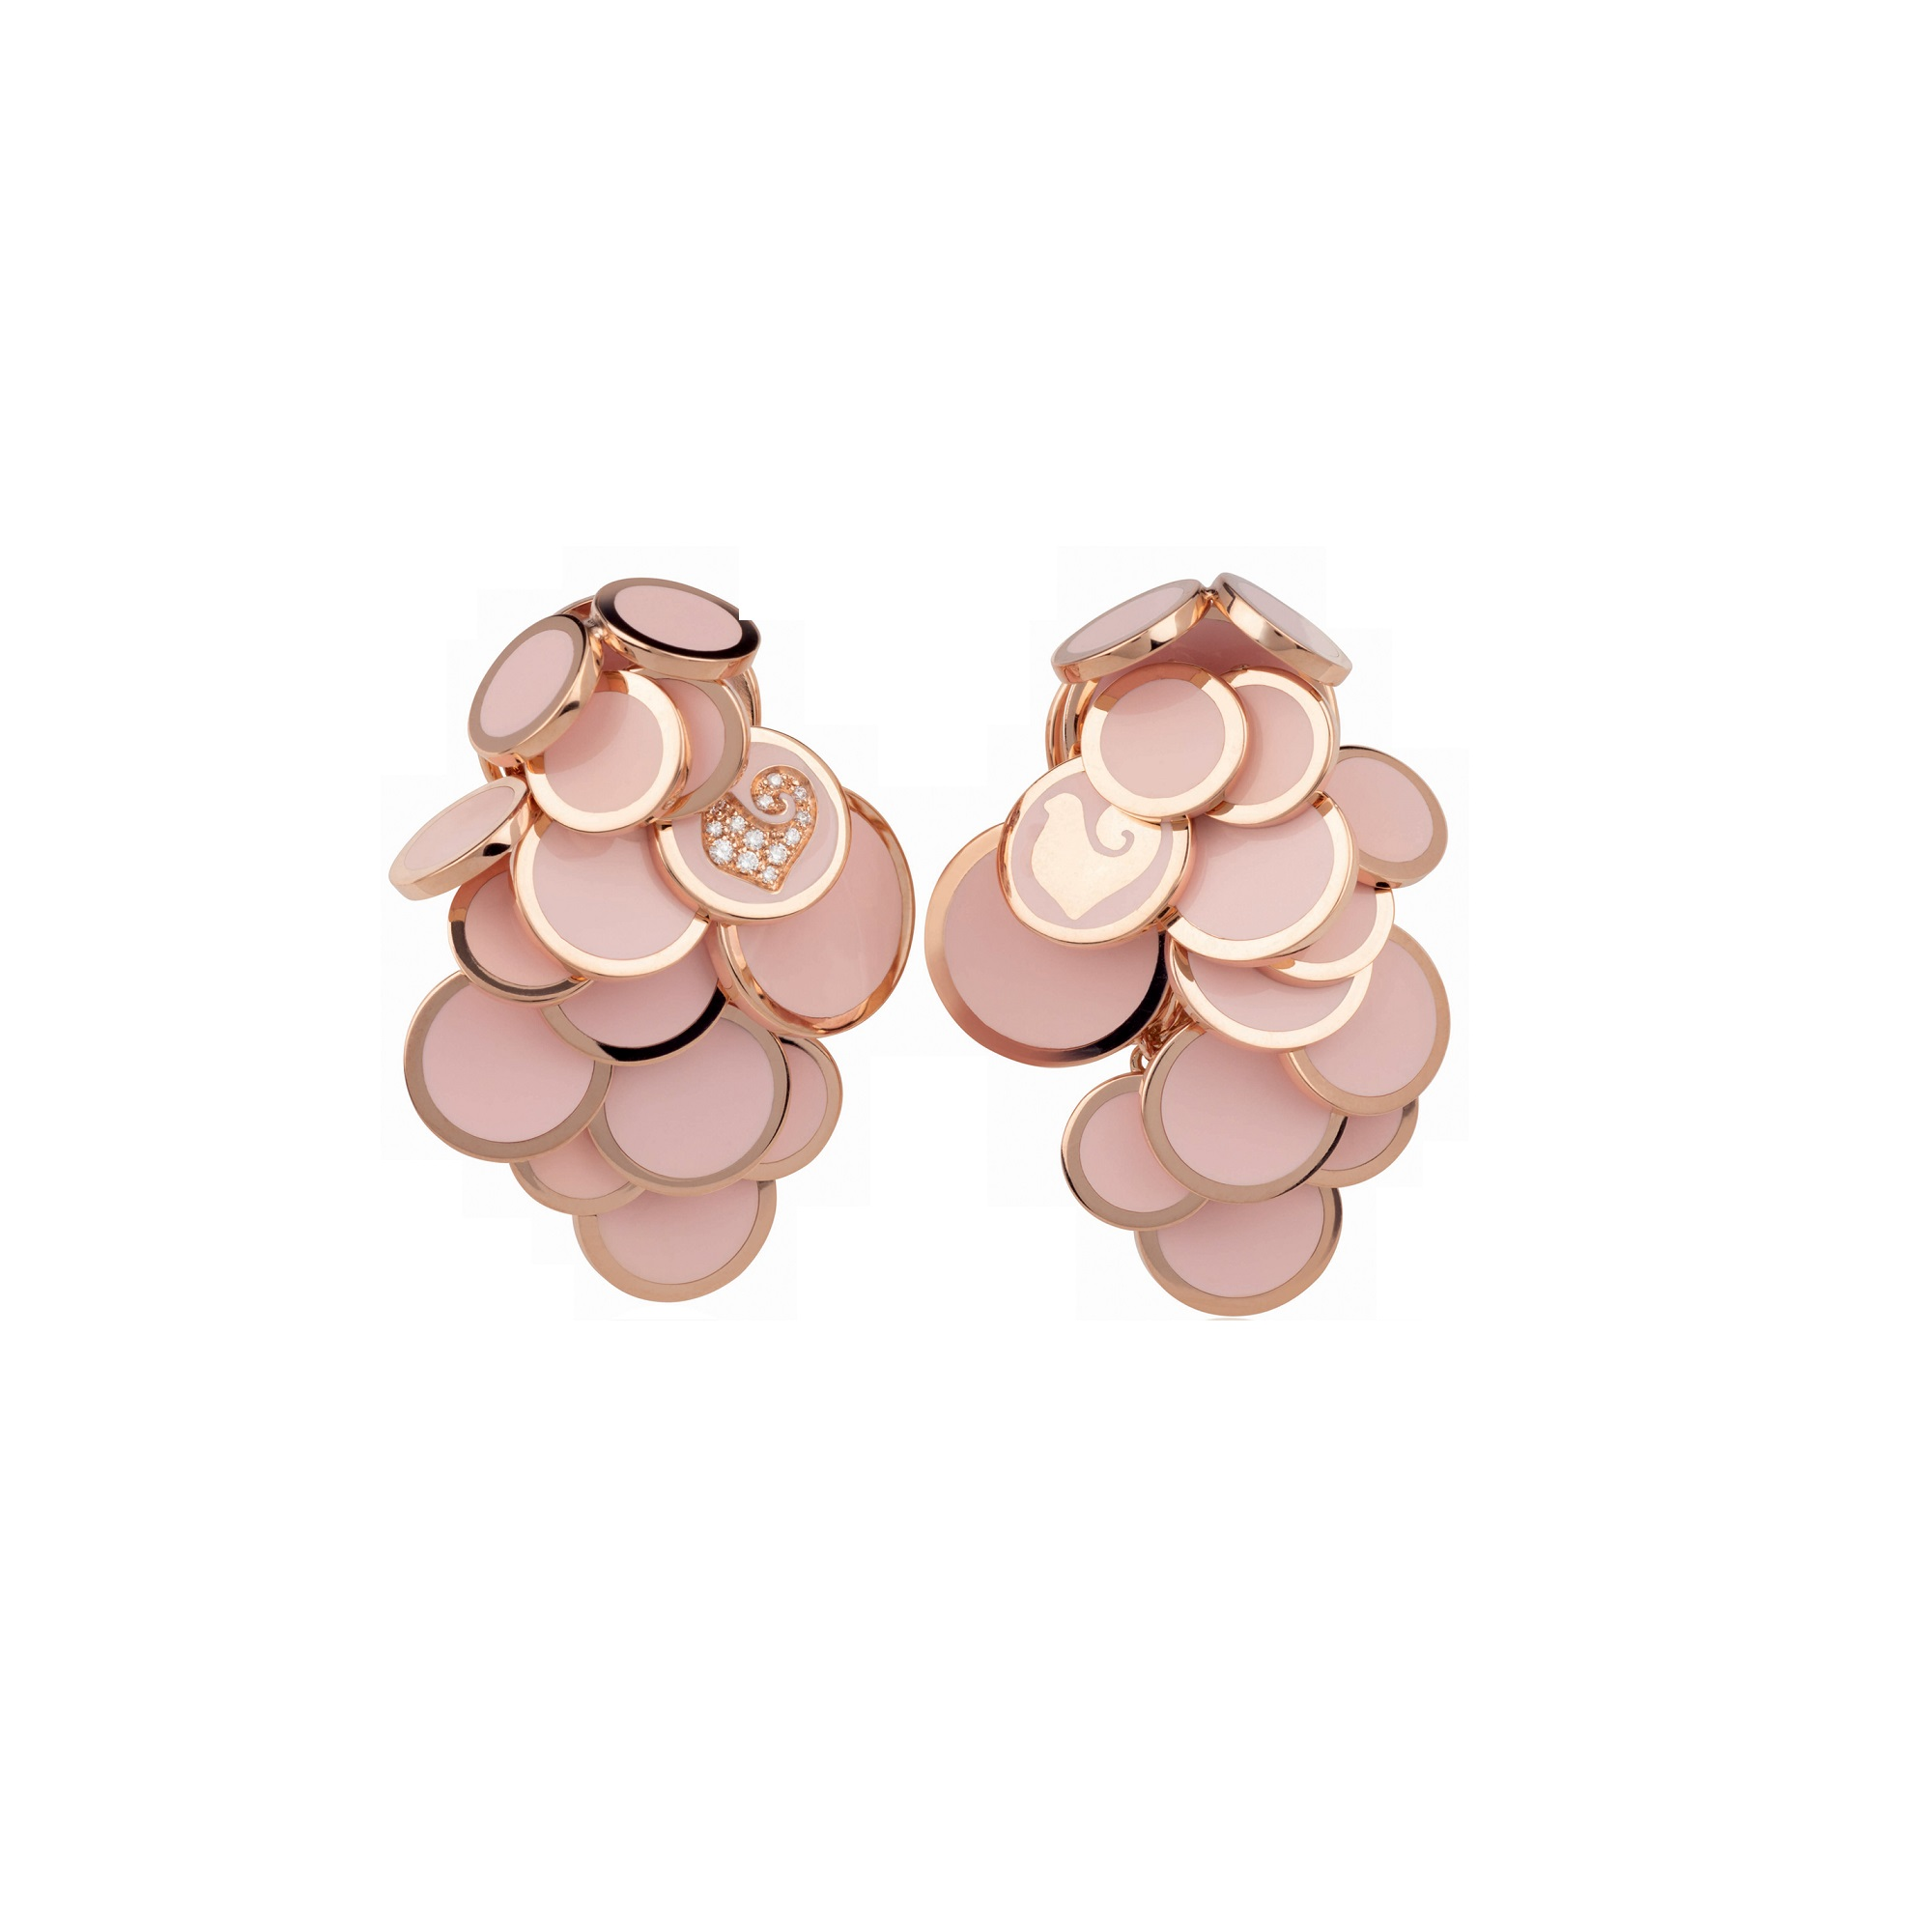 Chantecler Paillettes Ohrschmuck aus Roségold mit rosa Emaille und Brillanten